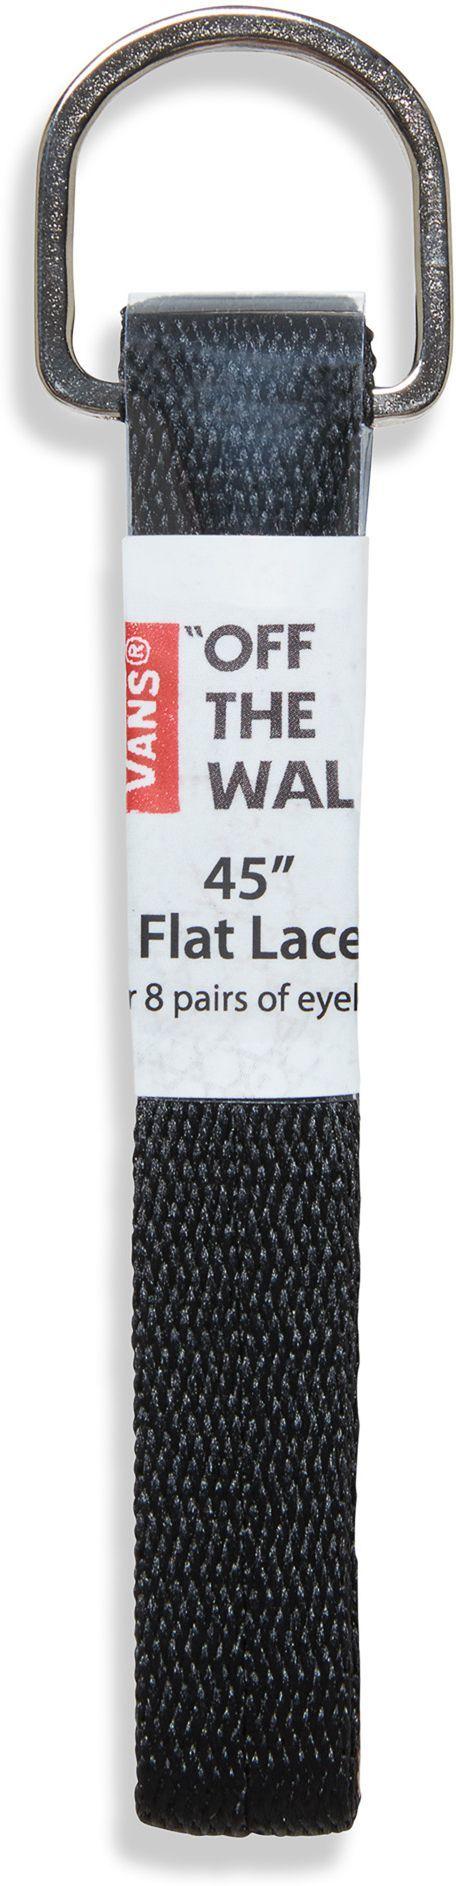 sznurowadła VANS FLAT LACES 45 Black